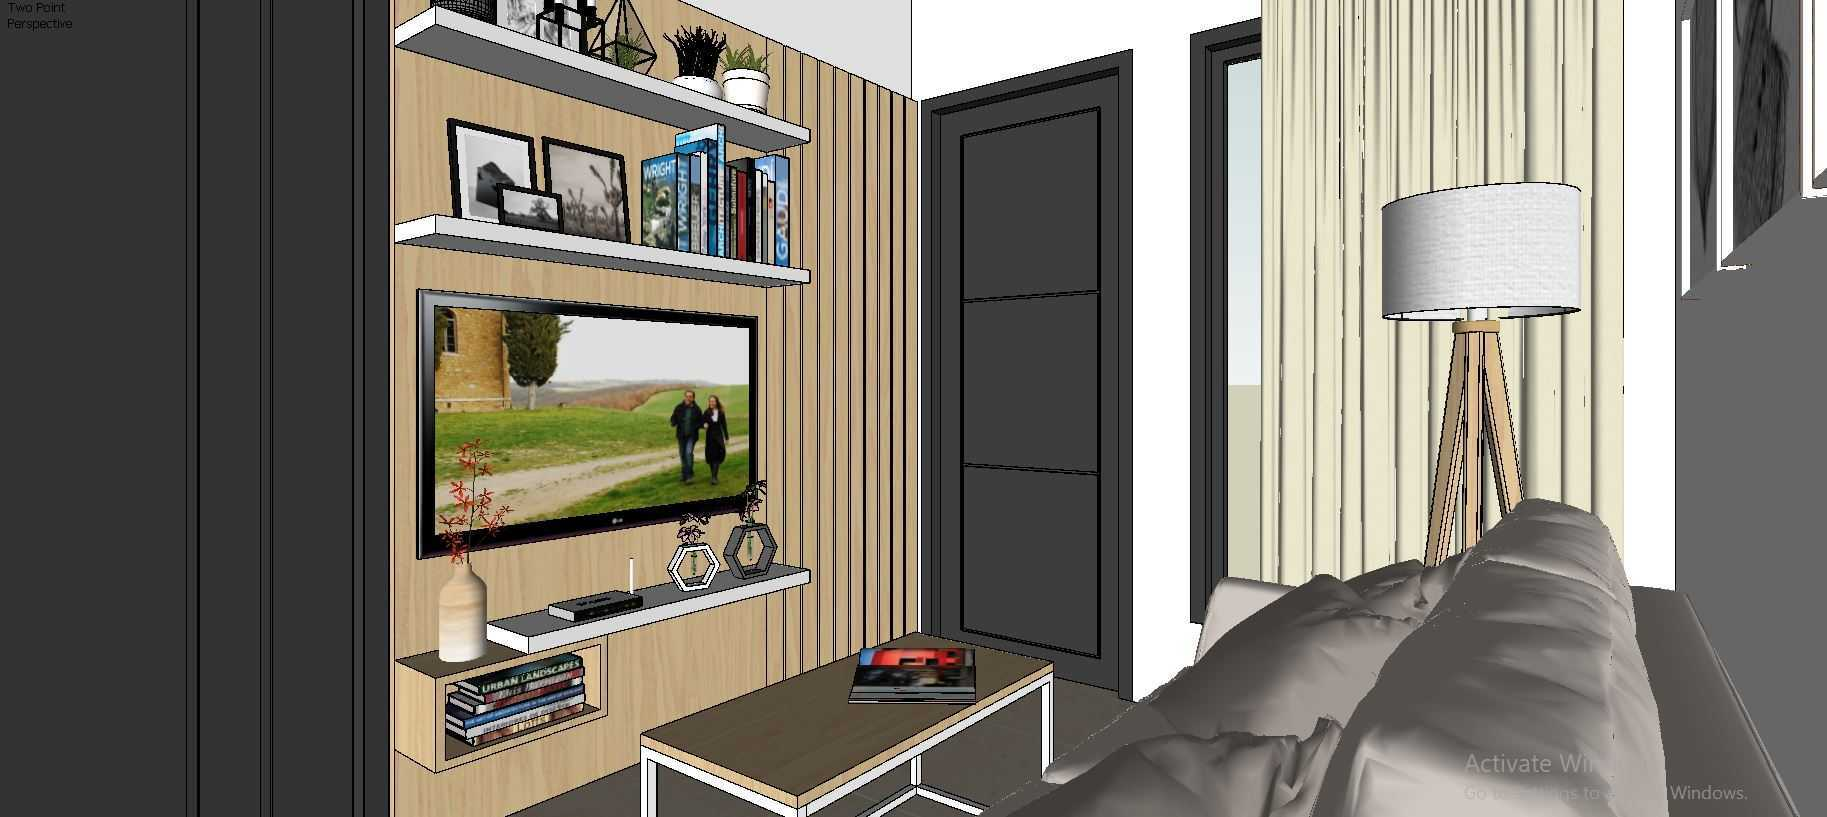 Arta Studio Billa's House Kec. Sawangan, Kota Depok, Jawa Barat, Indonesia Kec. Sawangan, Kota Depok, Jawa Barat, Indonesia Arief-Muhammad-Nasution-Billas-House  108278